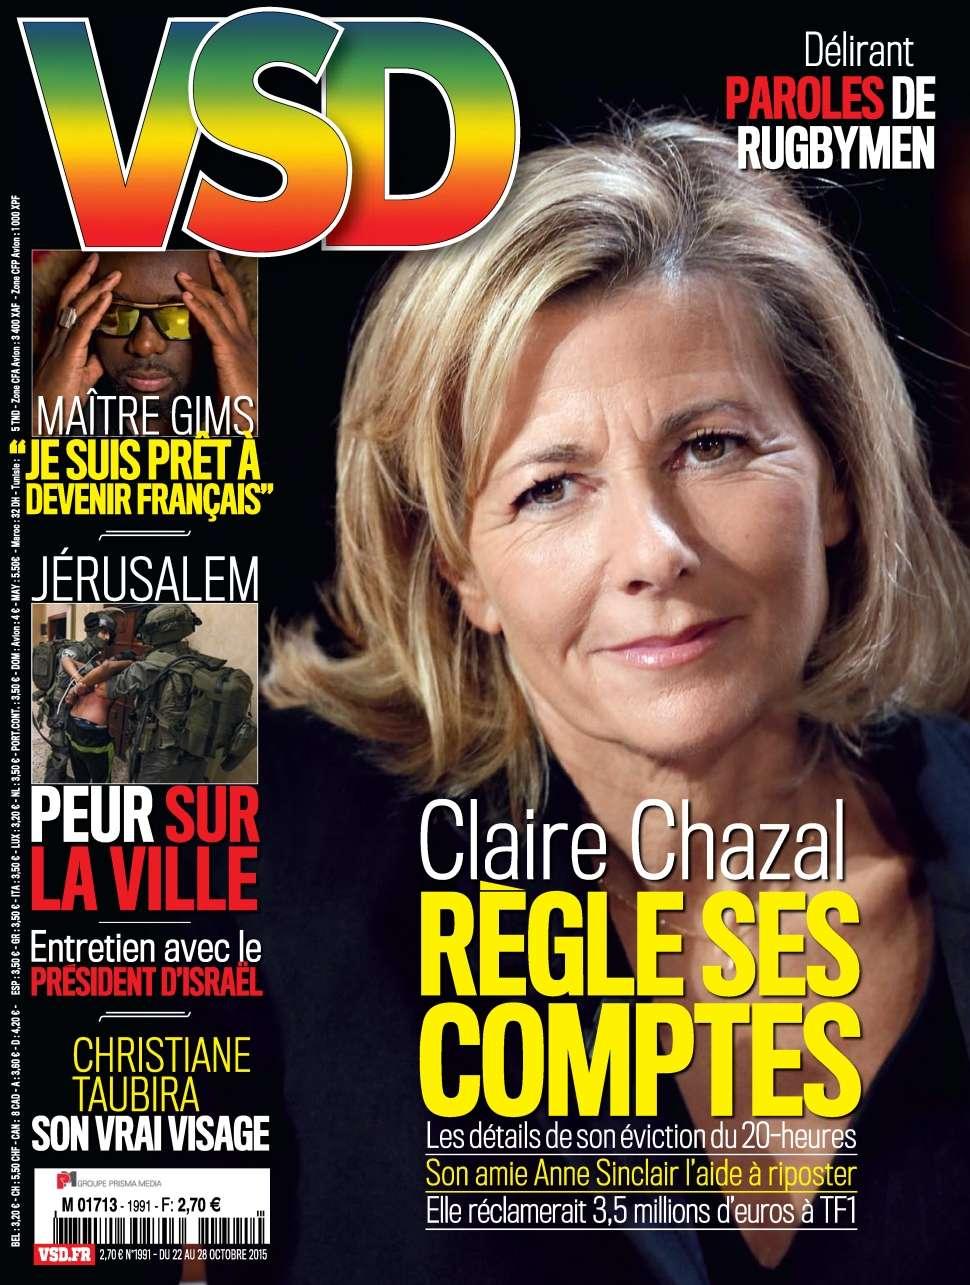 VSD 1991 - 22 au 28 Octobre 2015